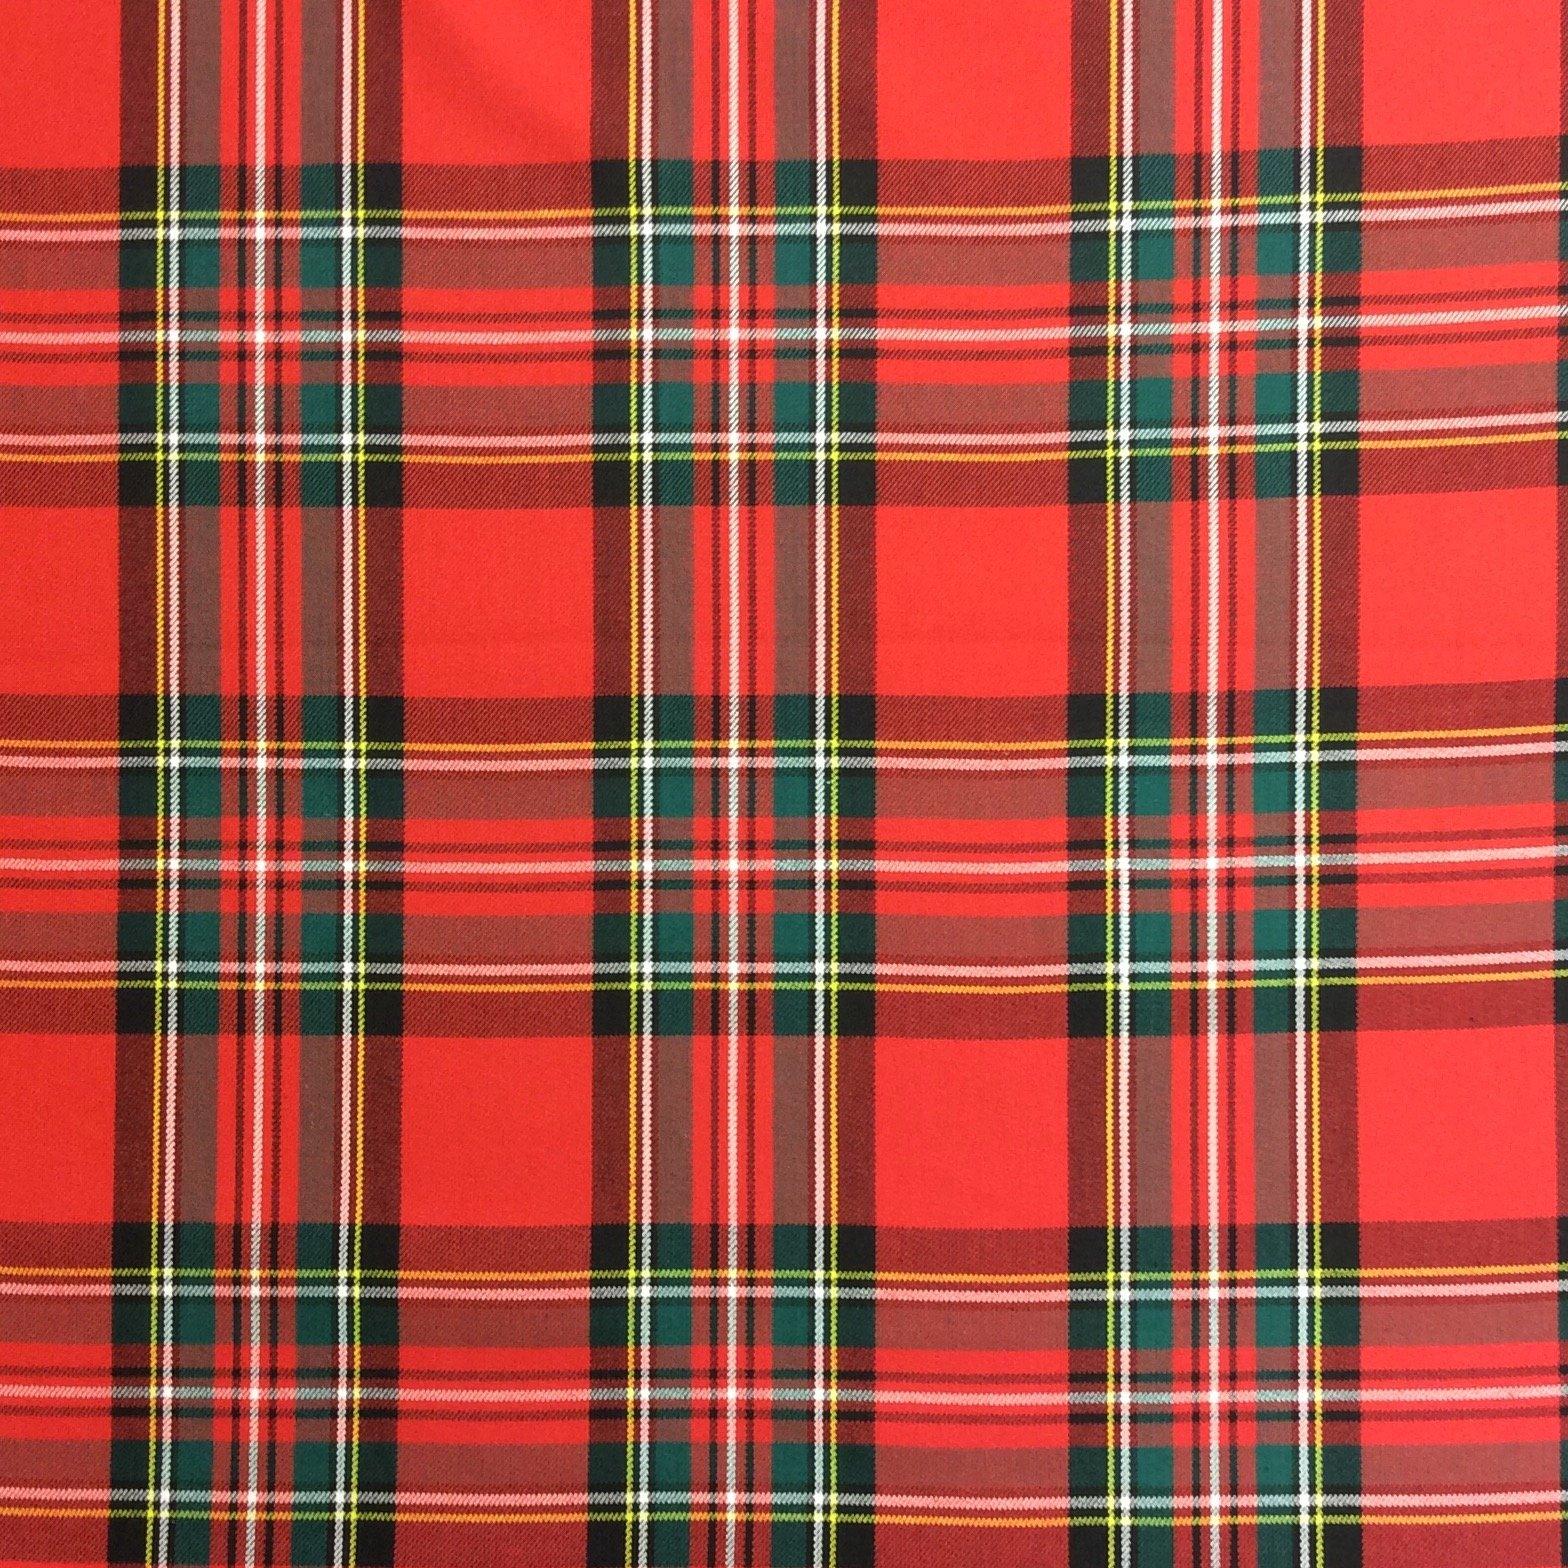 CV109   Tartan Plaid Cotton Fabric upholstery